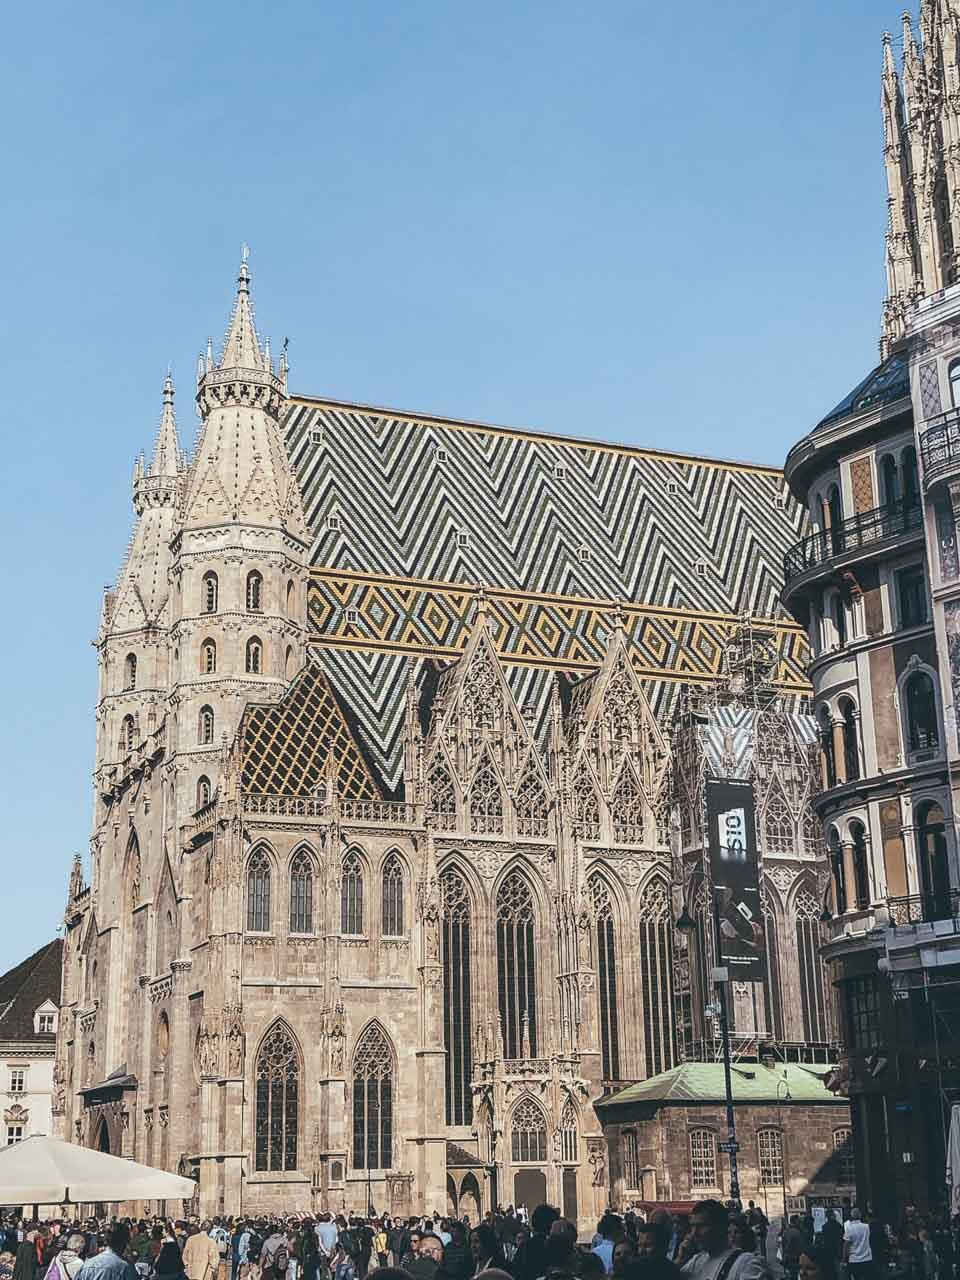 Stephansdom (St. Stephen's Cathedral) in Vienna, Austria